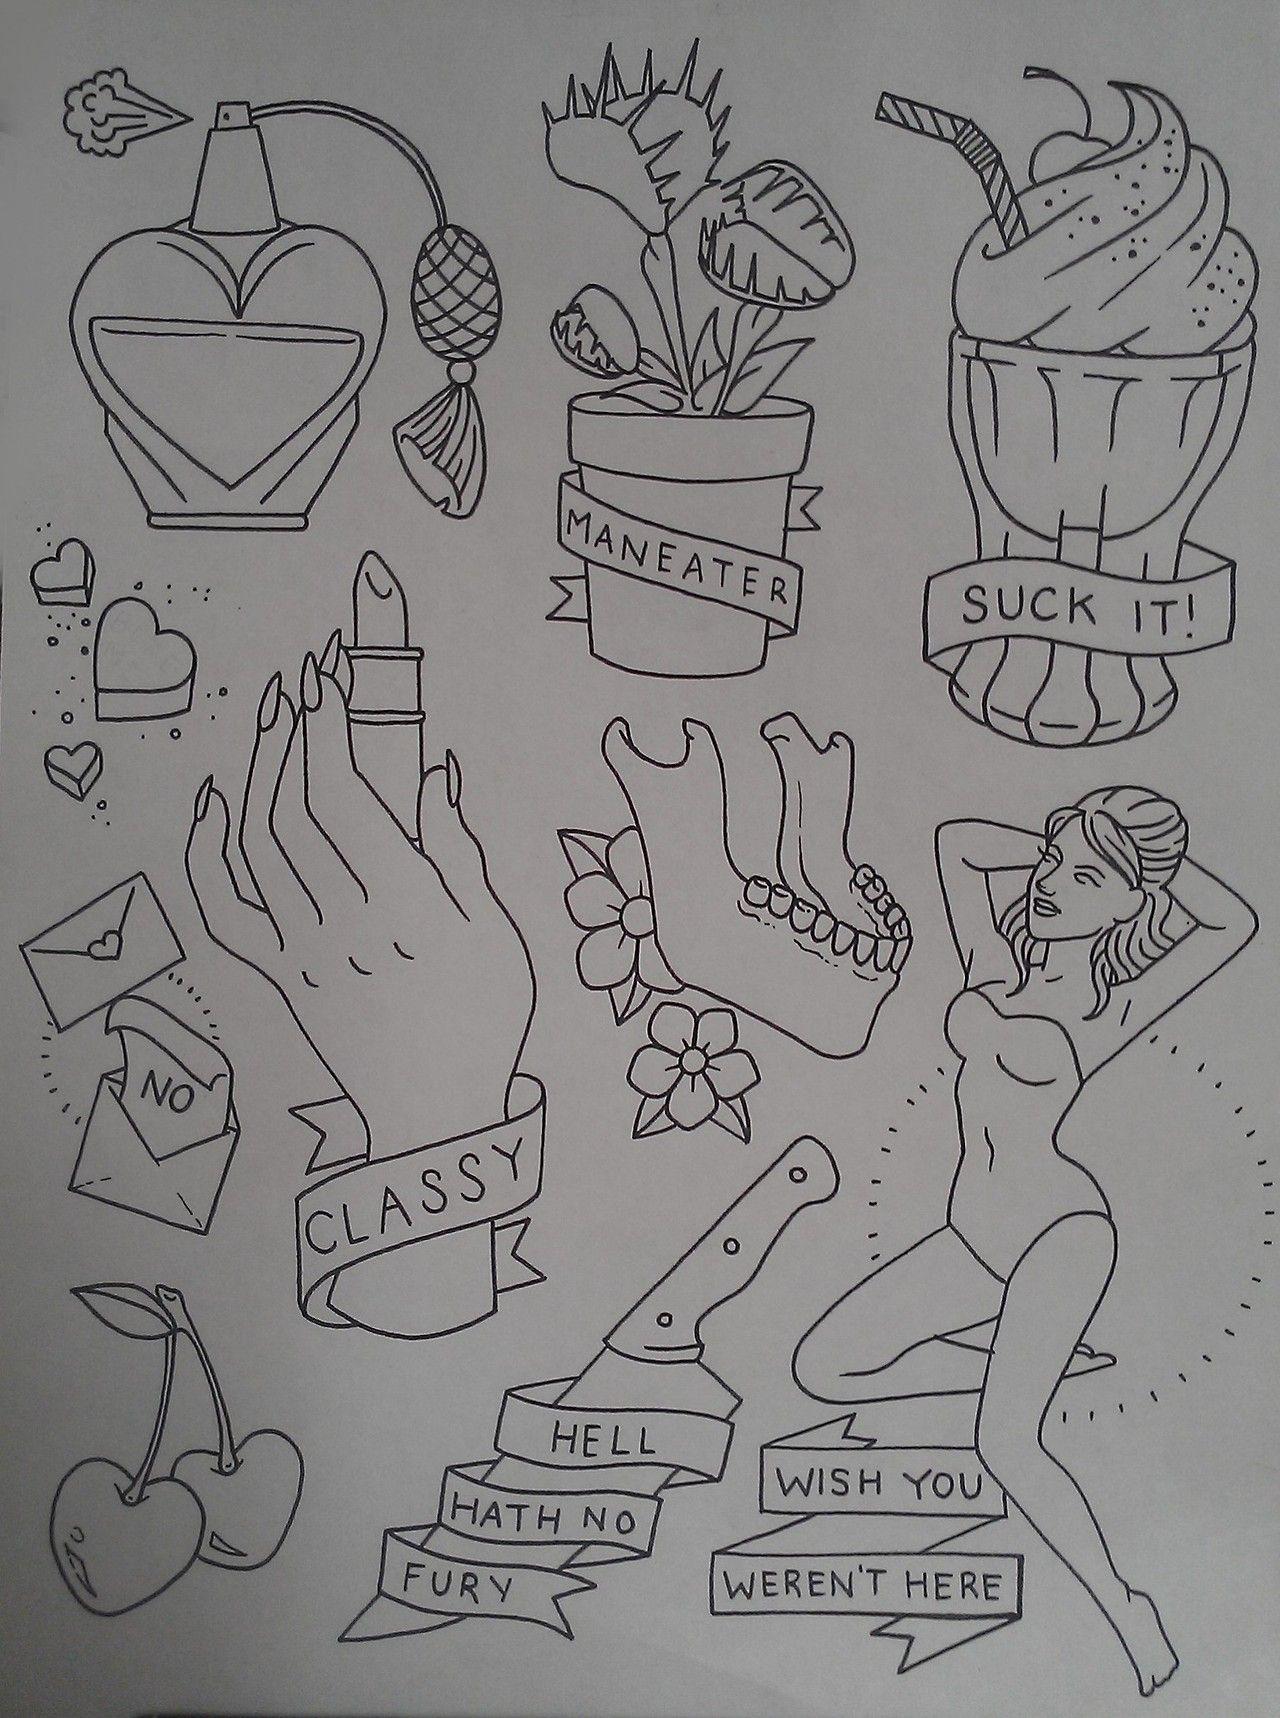 Tattoo ideas for men little craftastrophies make nice embroideries  drawing ideas u flashart